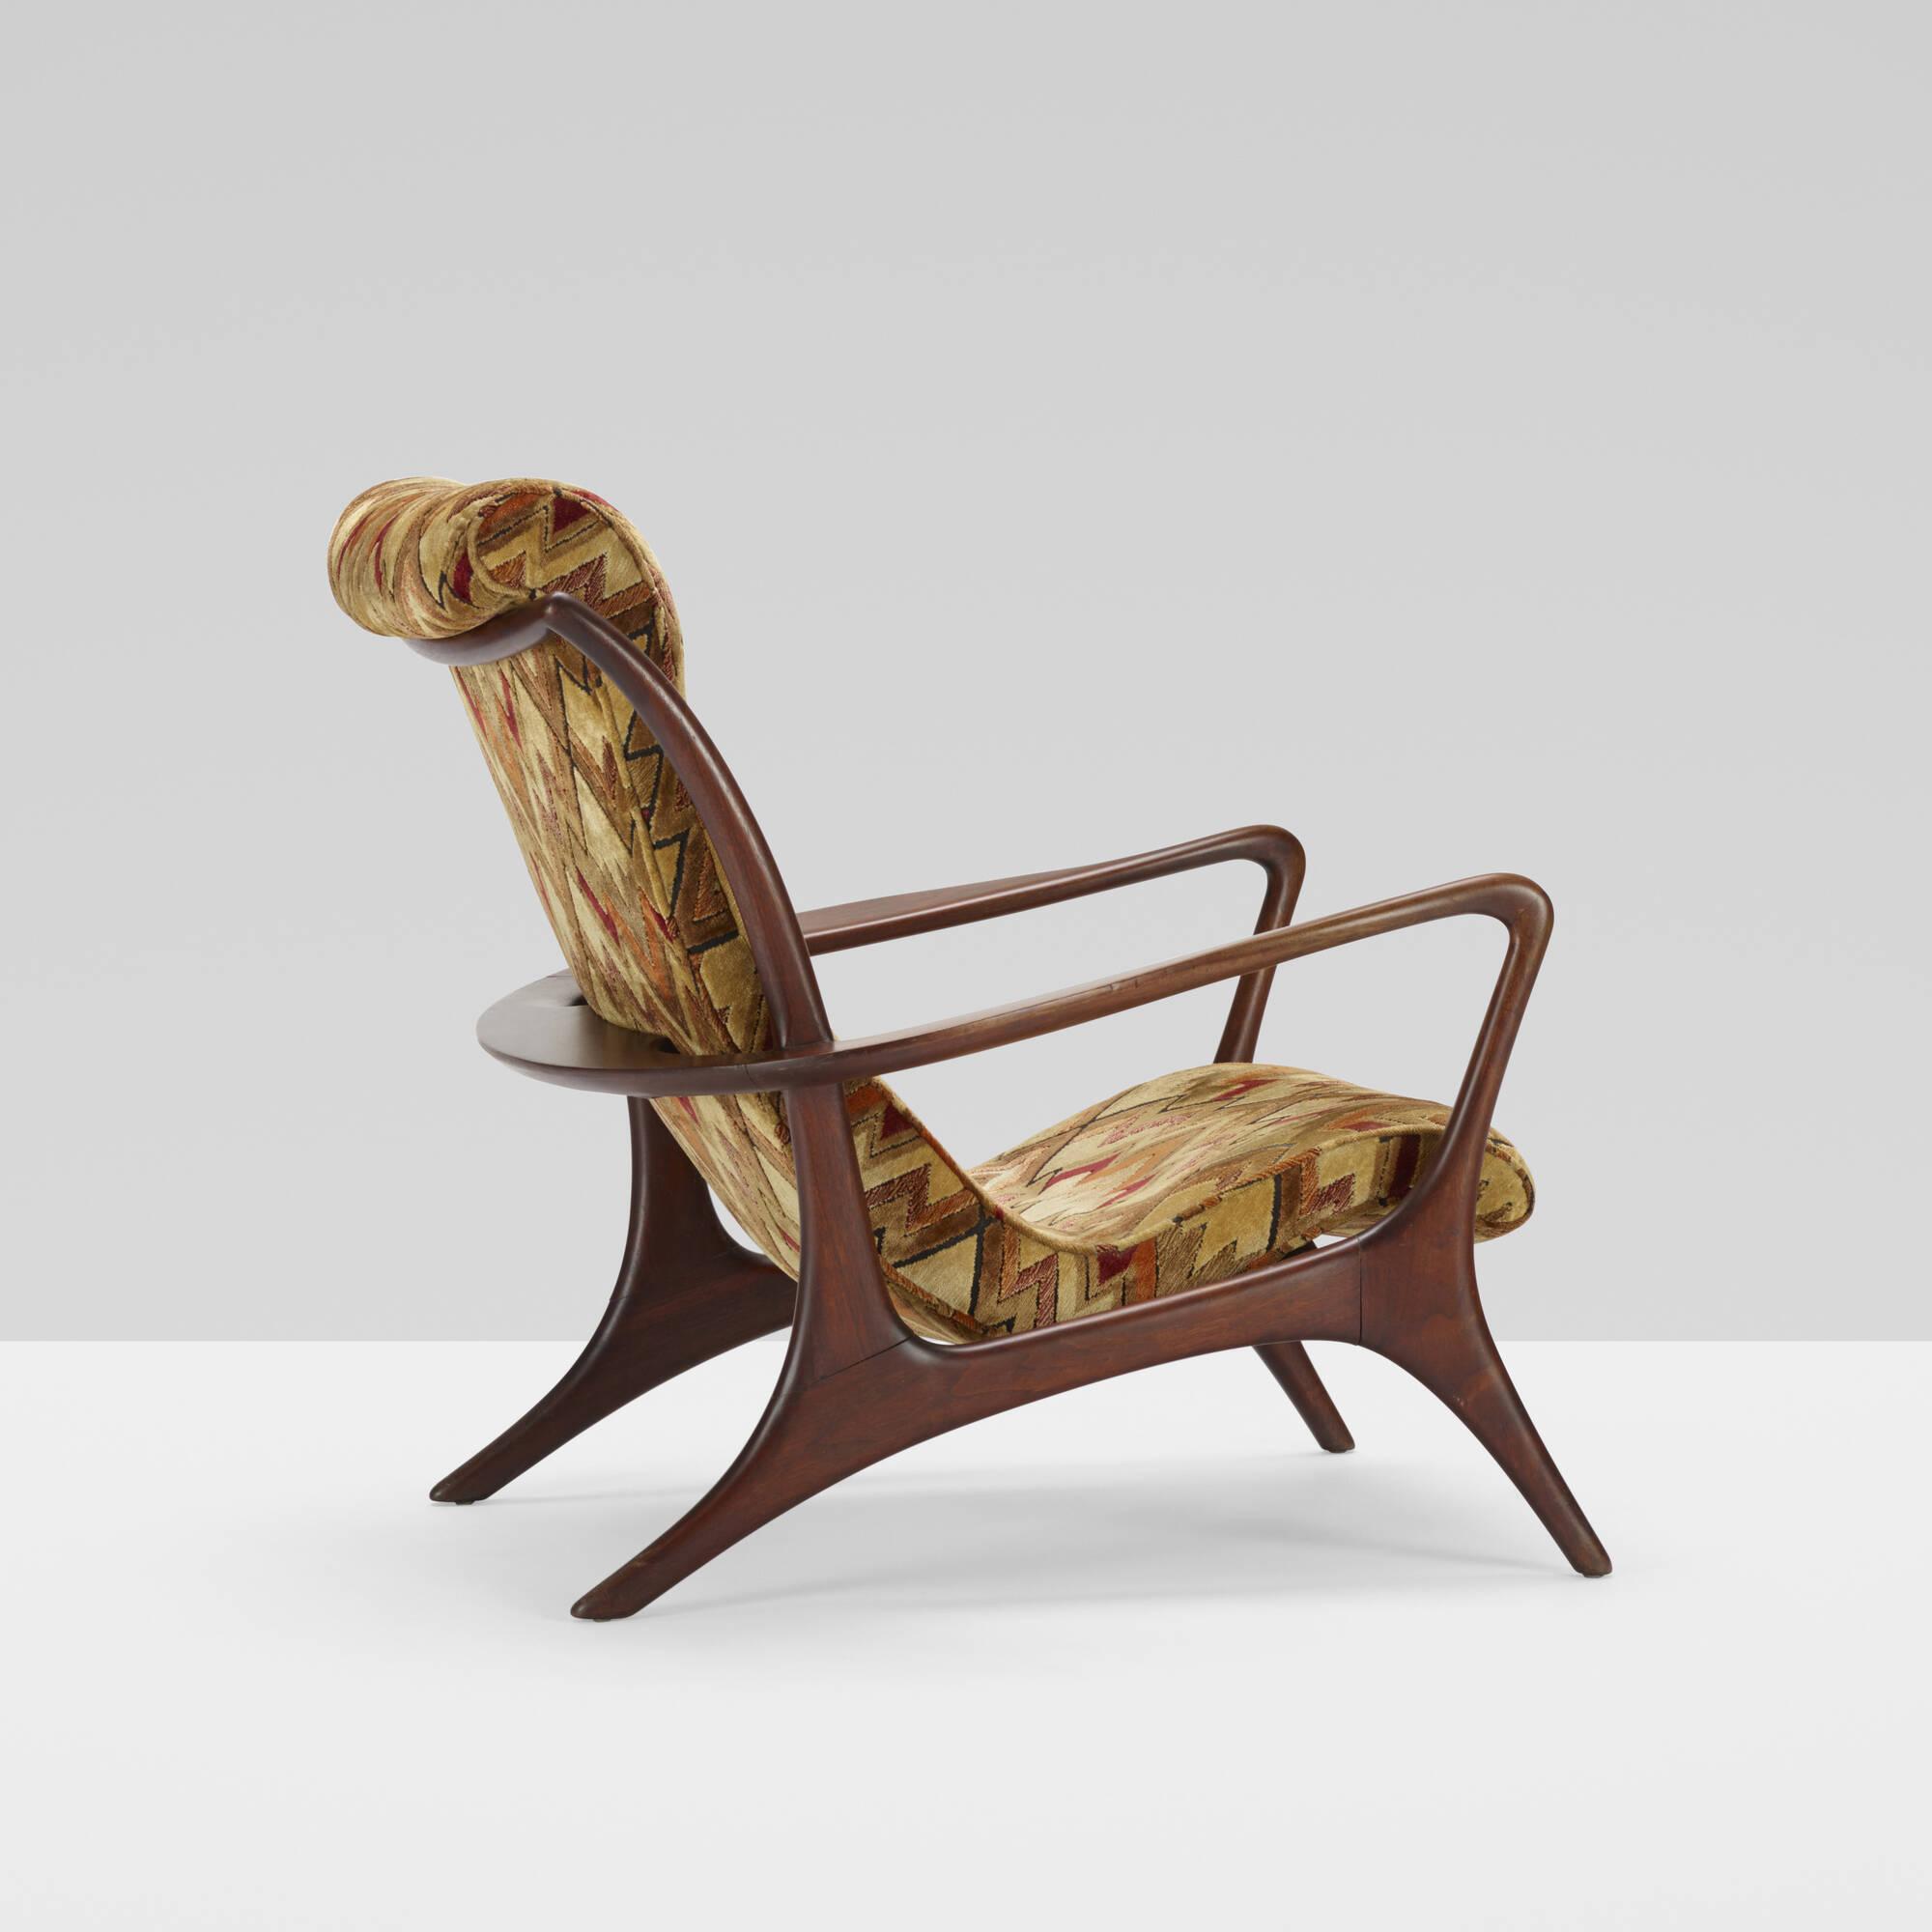 409: Vladimir Kagan / High Back Sculptured Contoured chair (2 of 3)